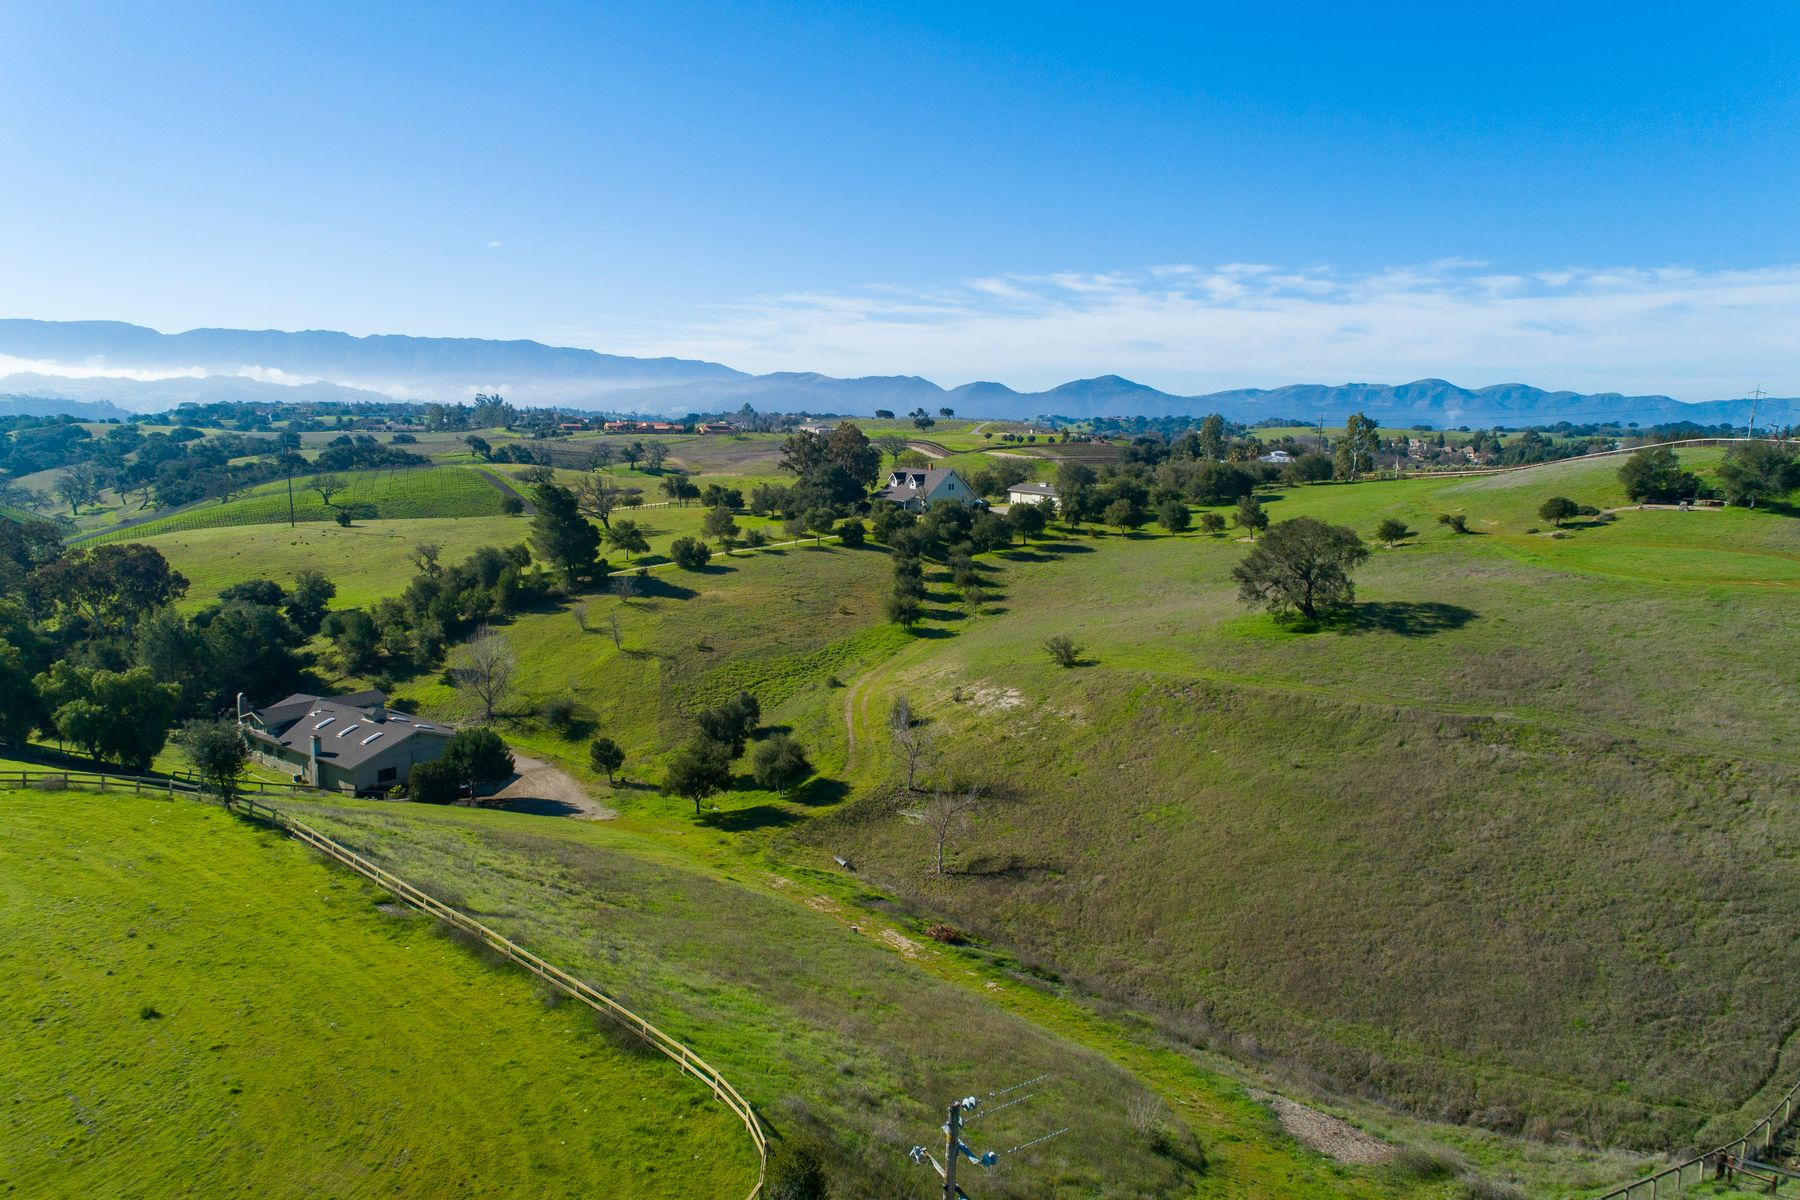 Vineyard Real Estate for Sale at Build In Ballard 2058 Adobe Canyon Road Solvang, California 93463 United States